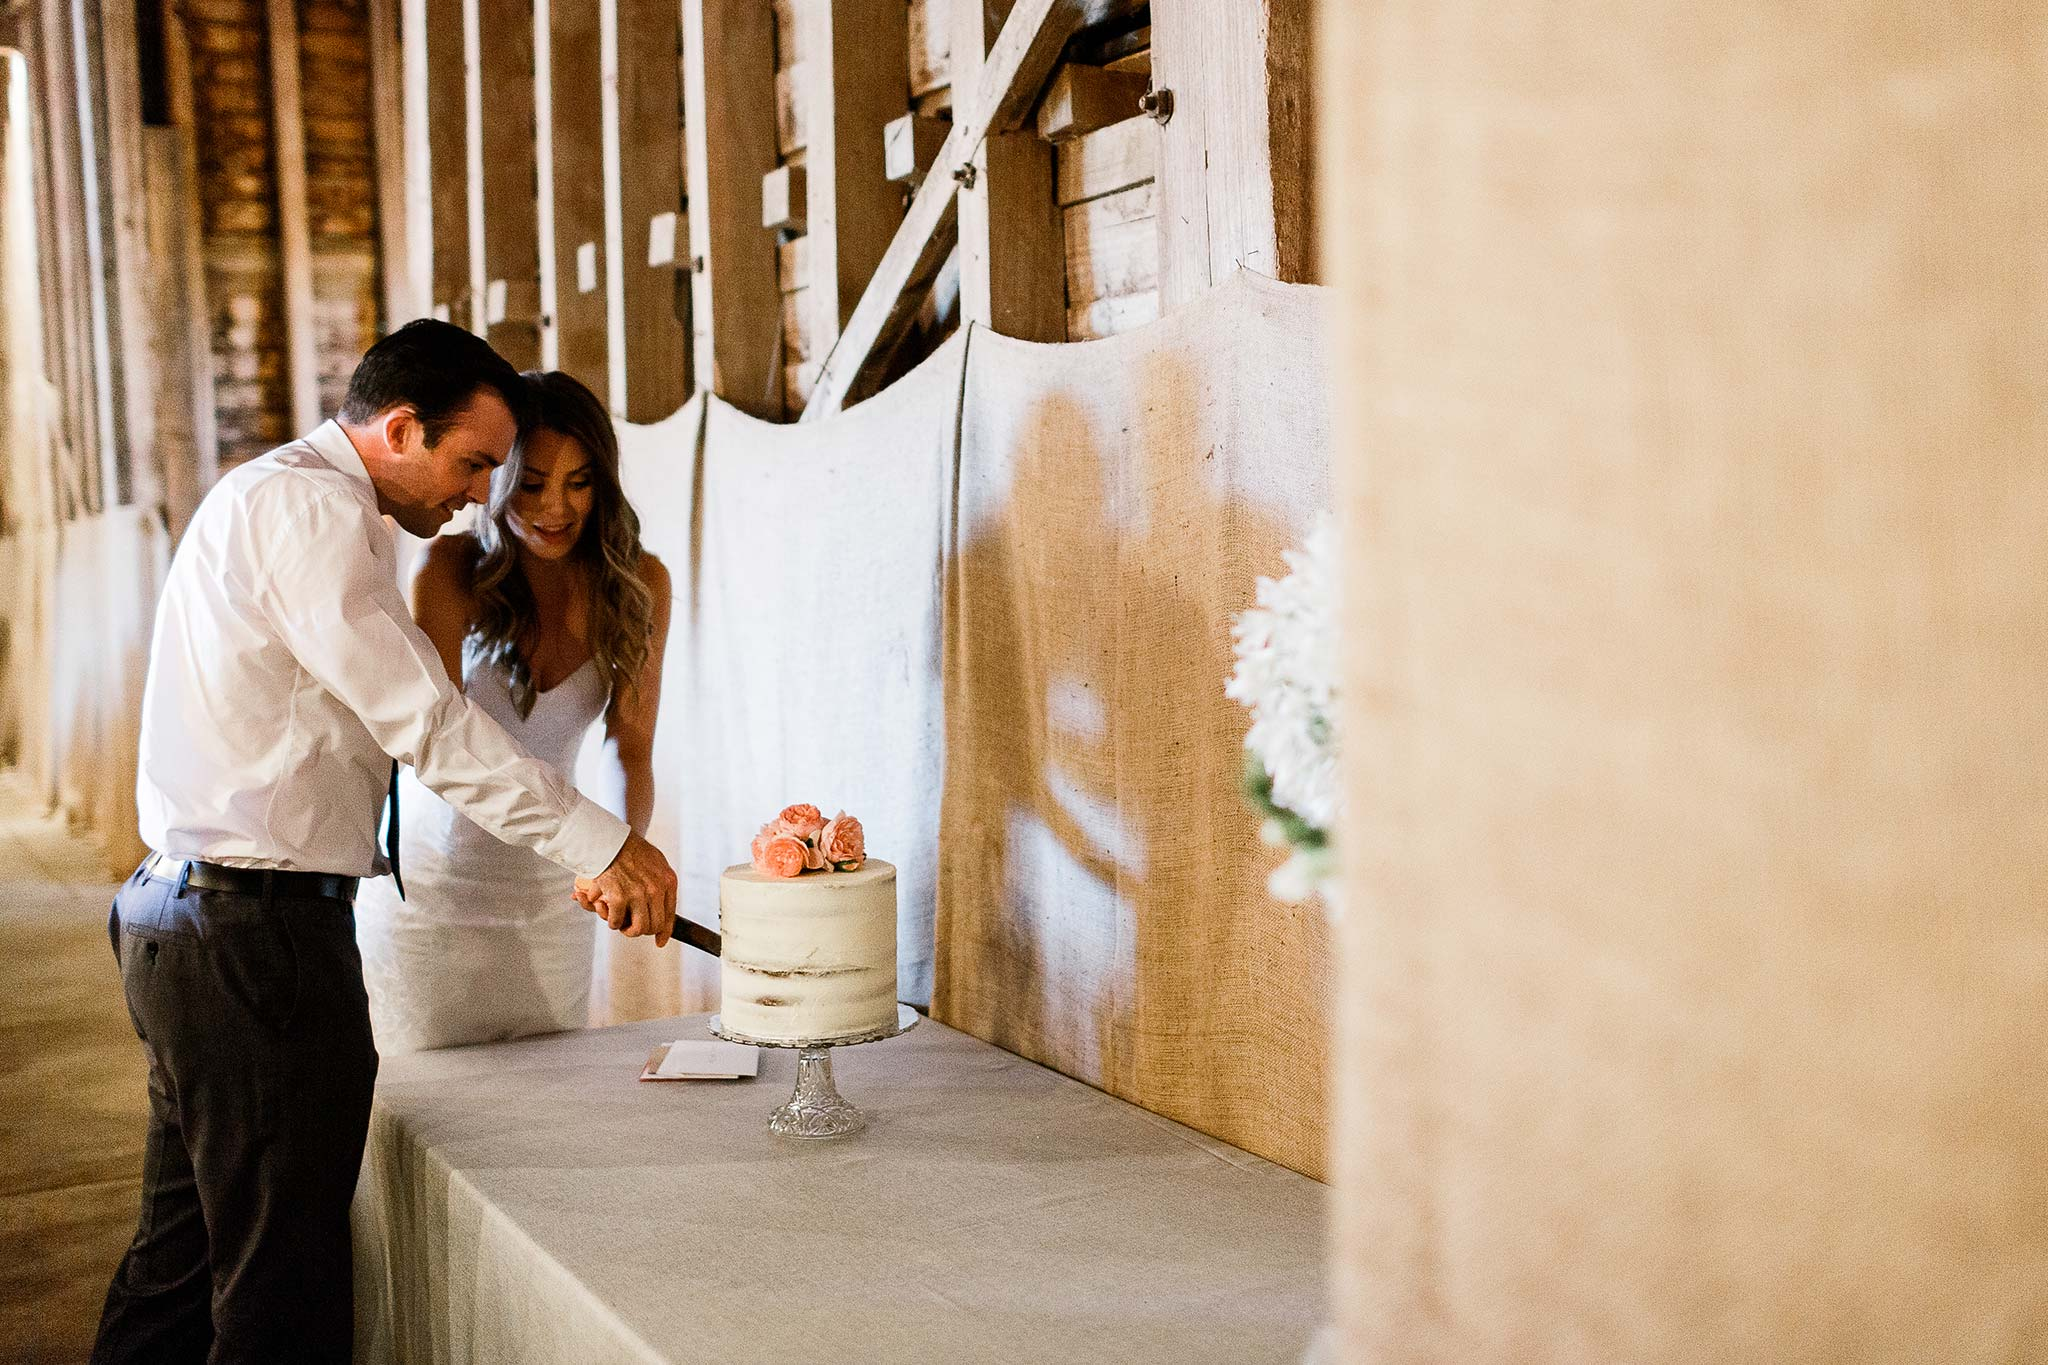 Launceston-Brickendon-barn-Wedding-Photographer-reception-cake-cutting